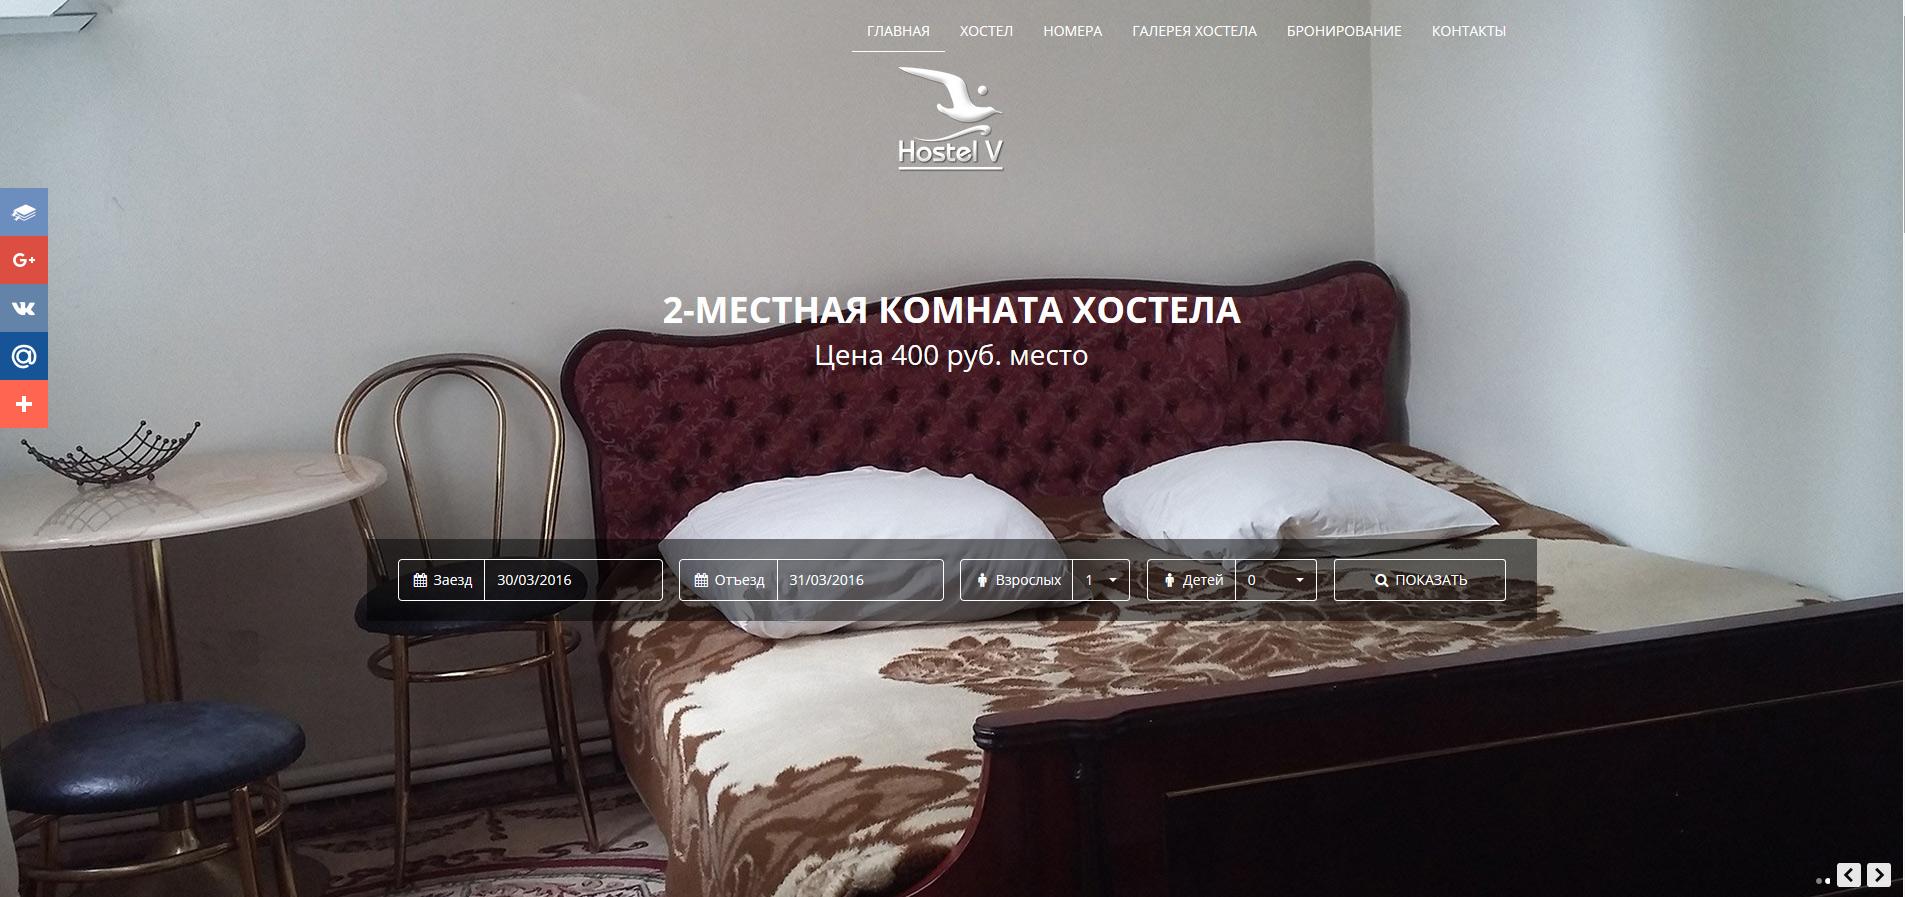 Сайт Хостела